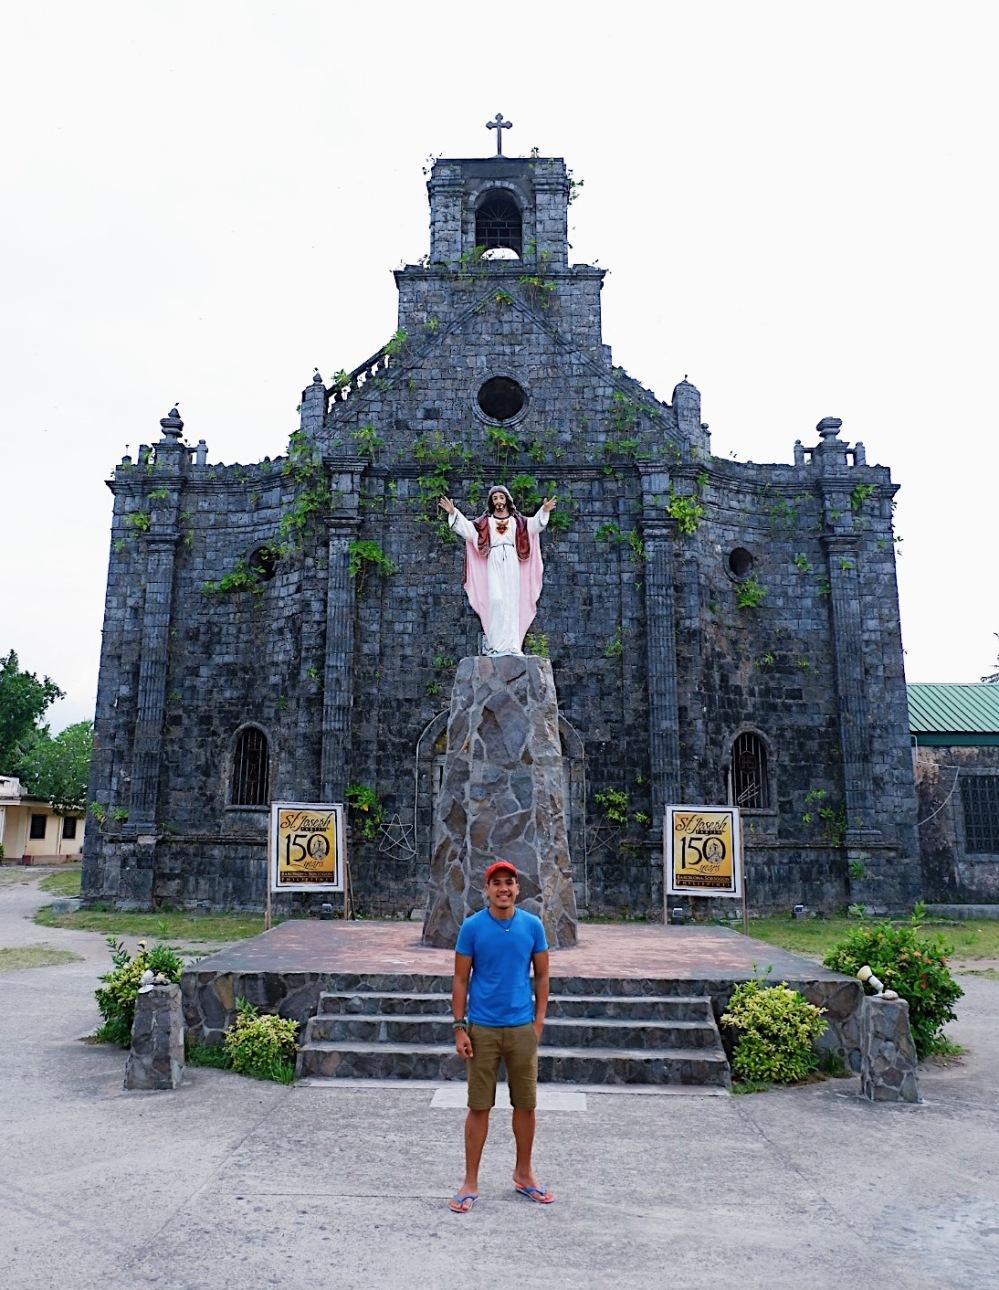 SORSOGON CHURCH